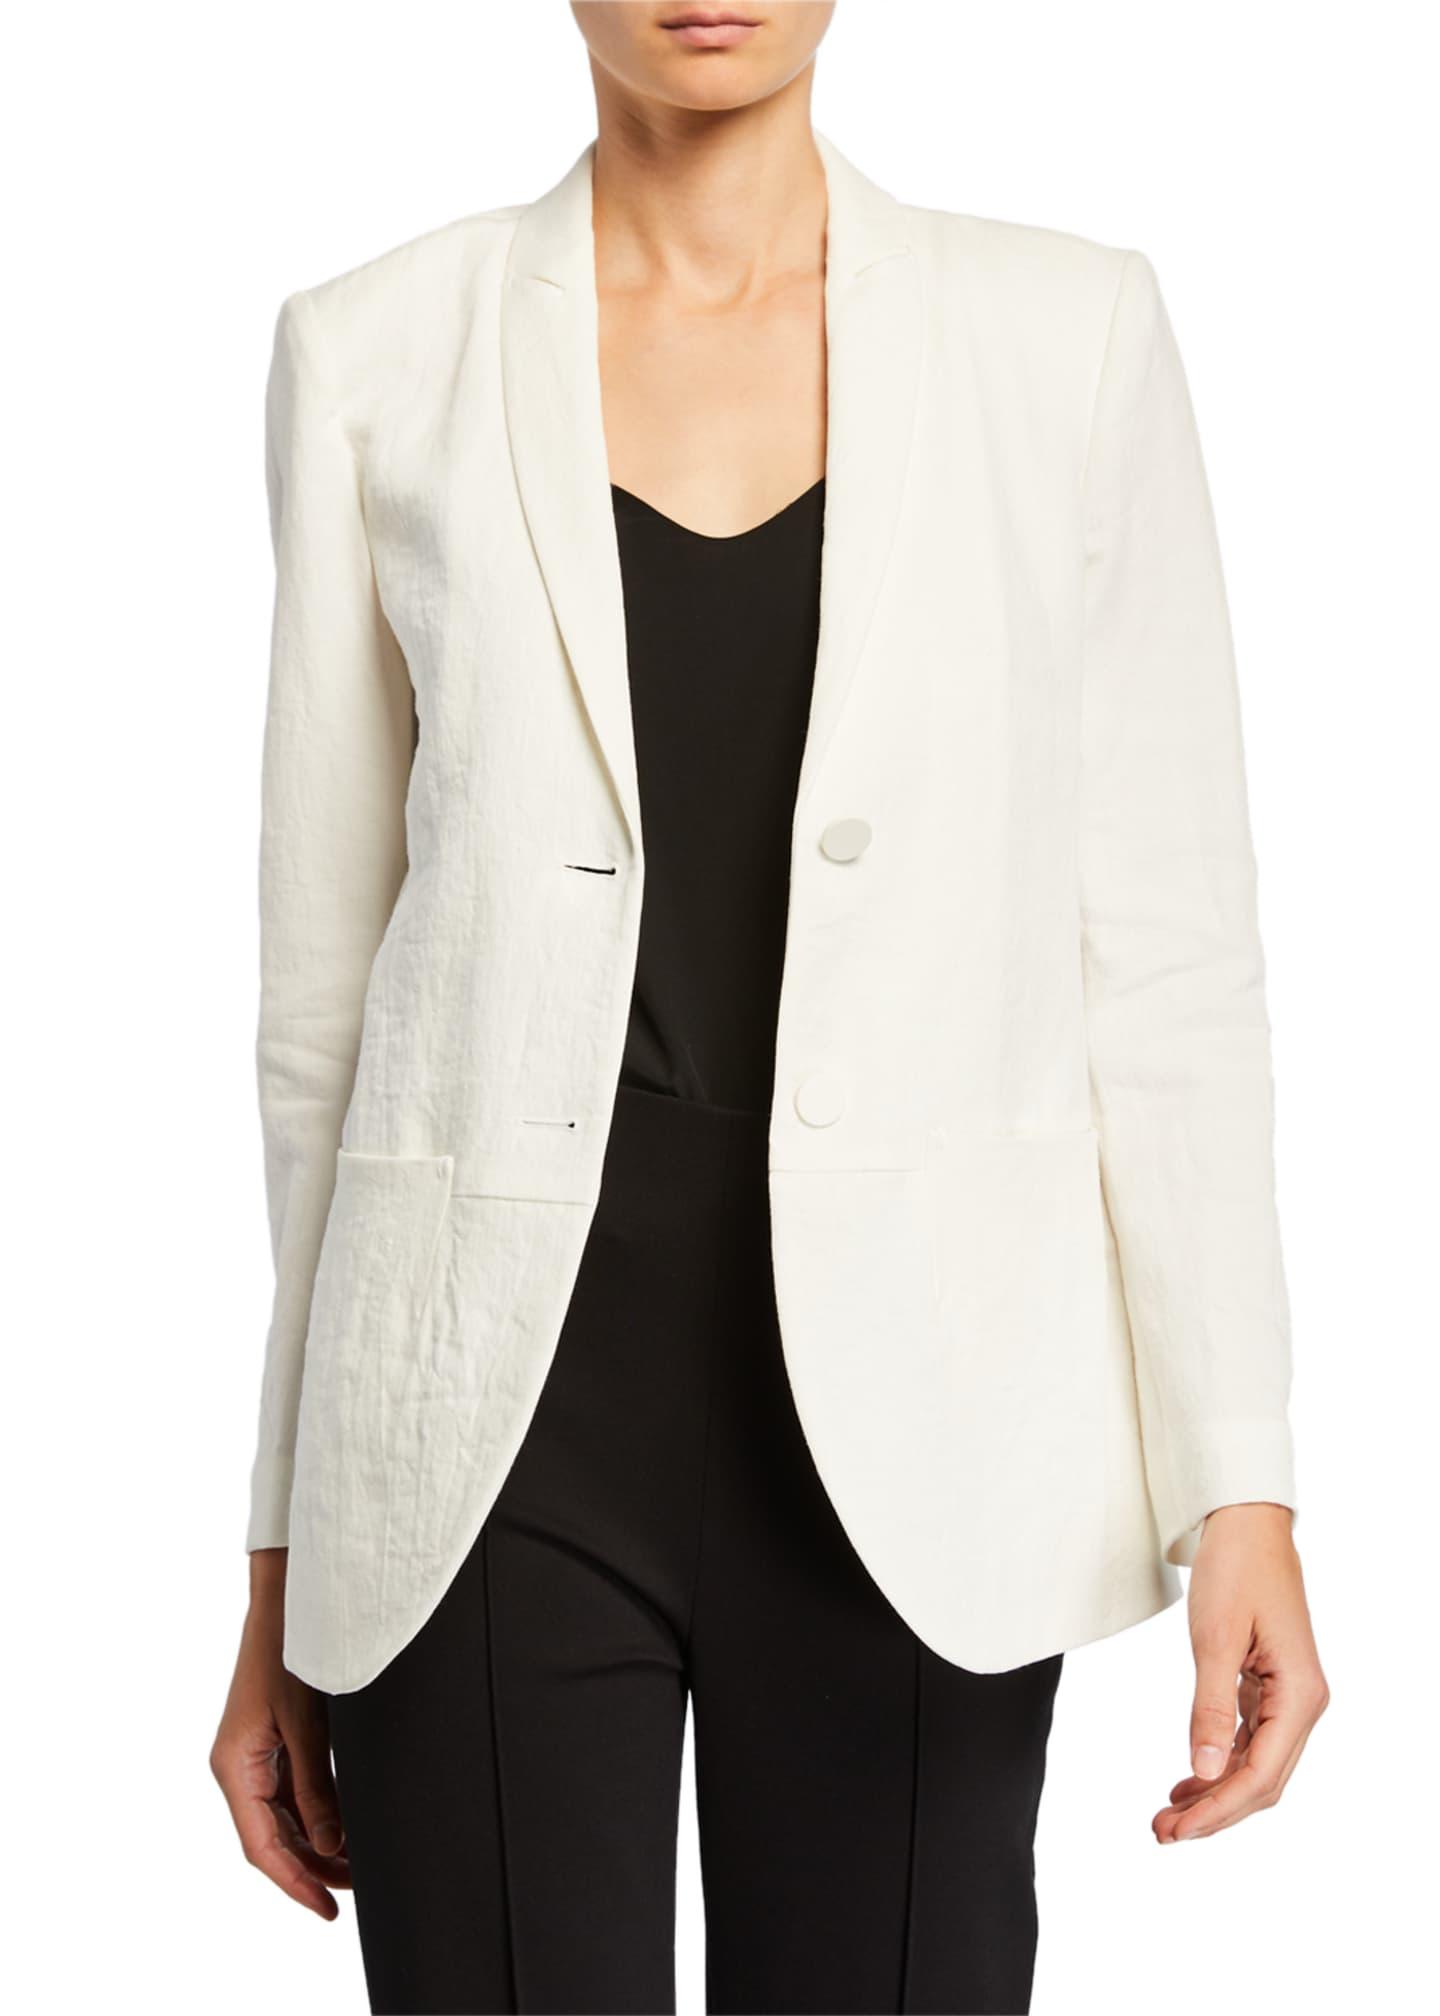 Giorgio Armani Linen & Flax Easy Two-Button Jacket